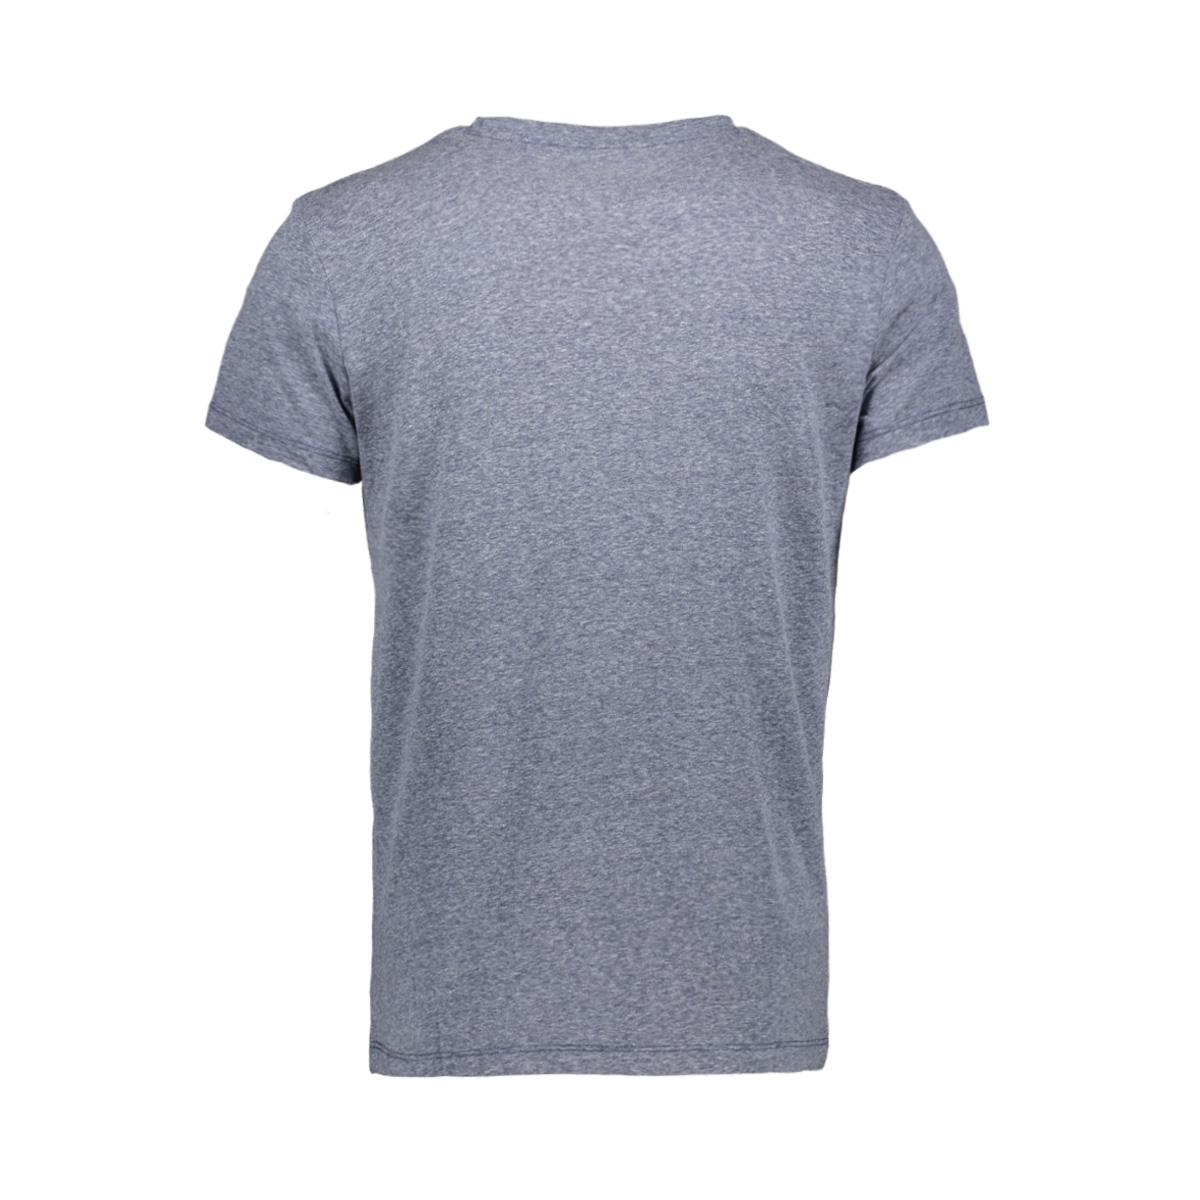 t shirt met print 1010855xx12 tom tailor t-shirt 10860